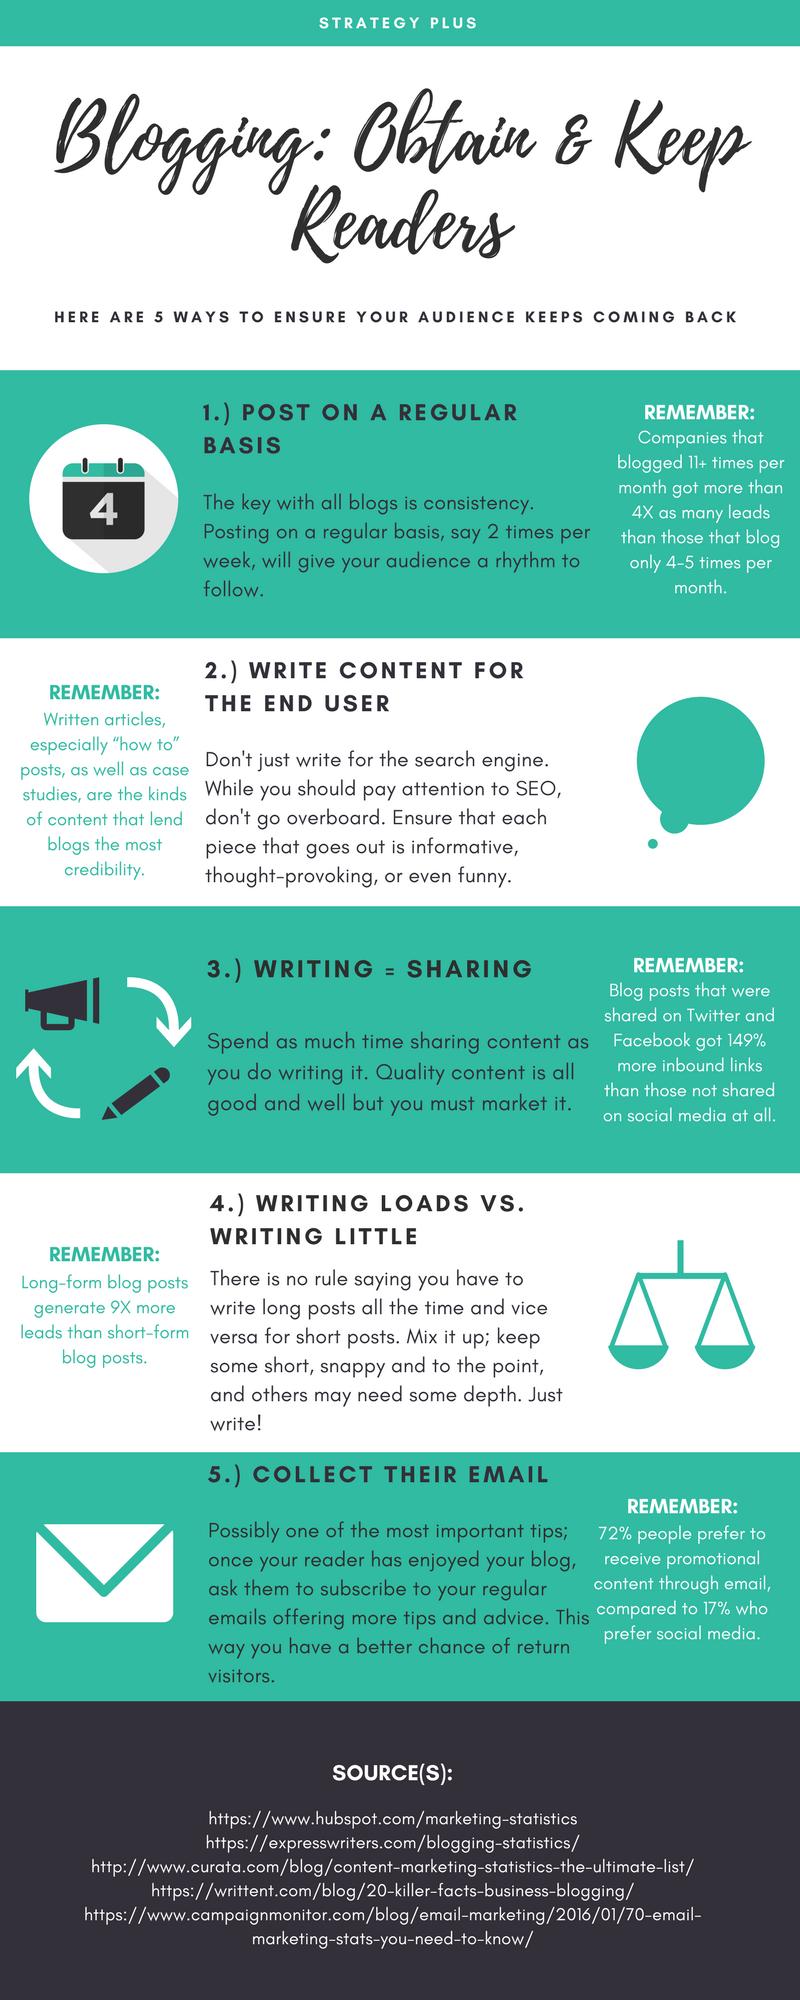 Blogging: Obtain & Keep Readers 4